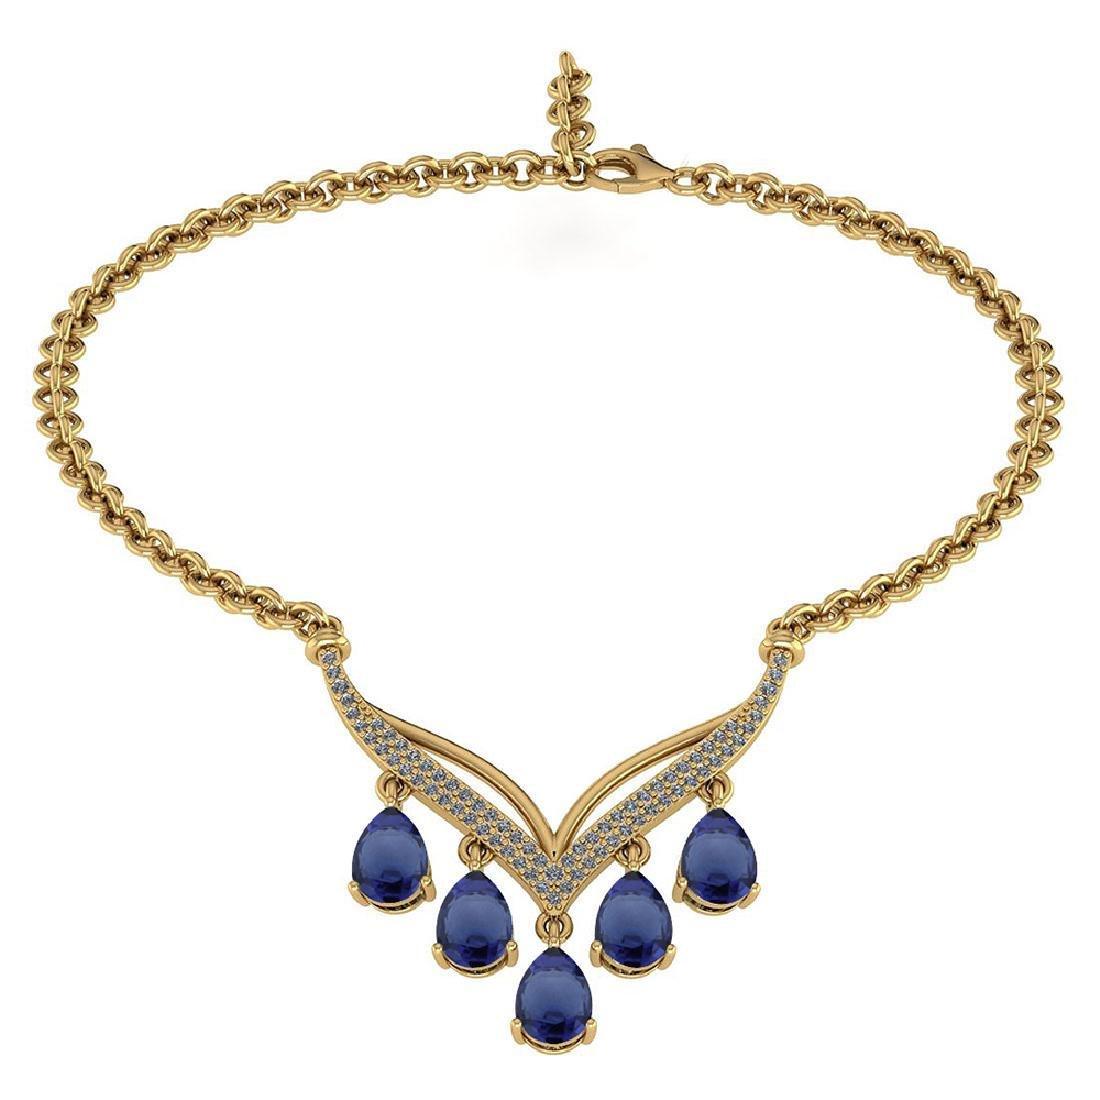 Certified 4.19 CTW Genuine Blue Sapphire And Diamond 14